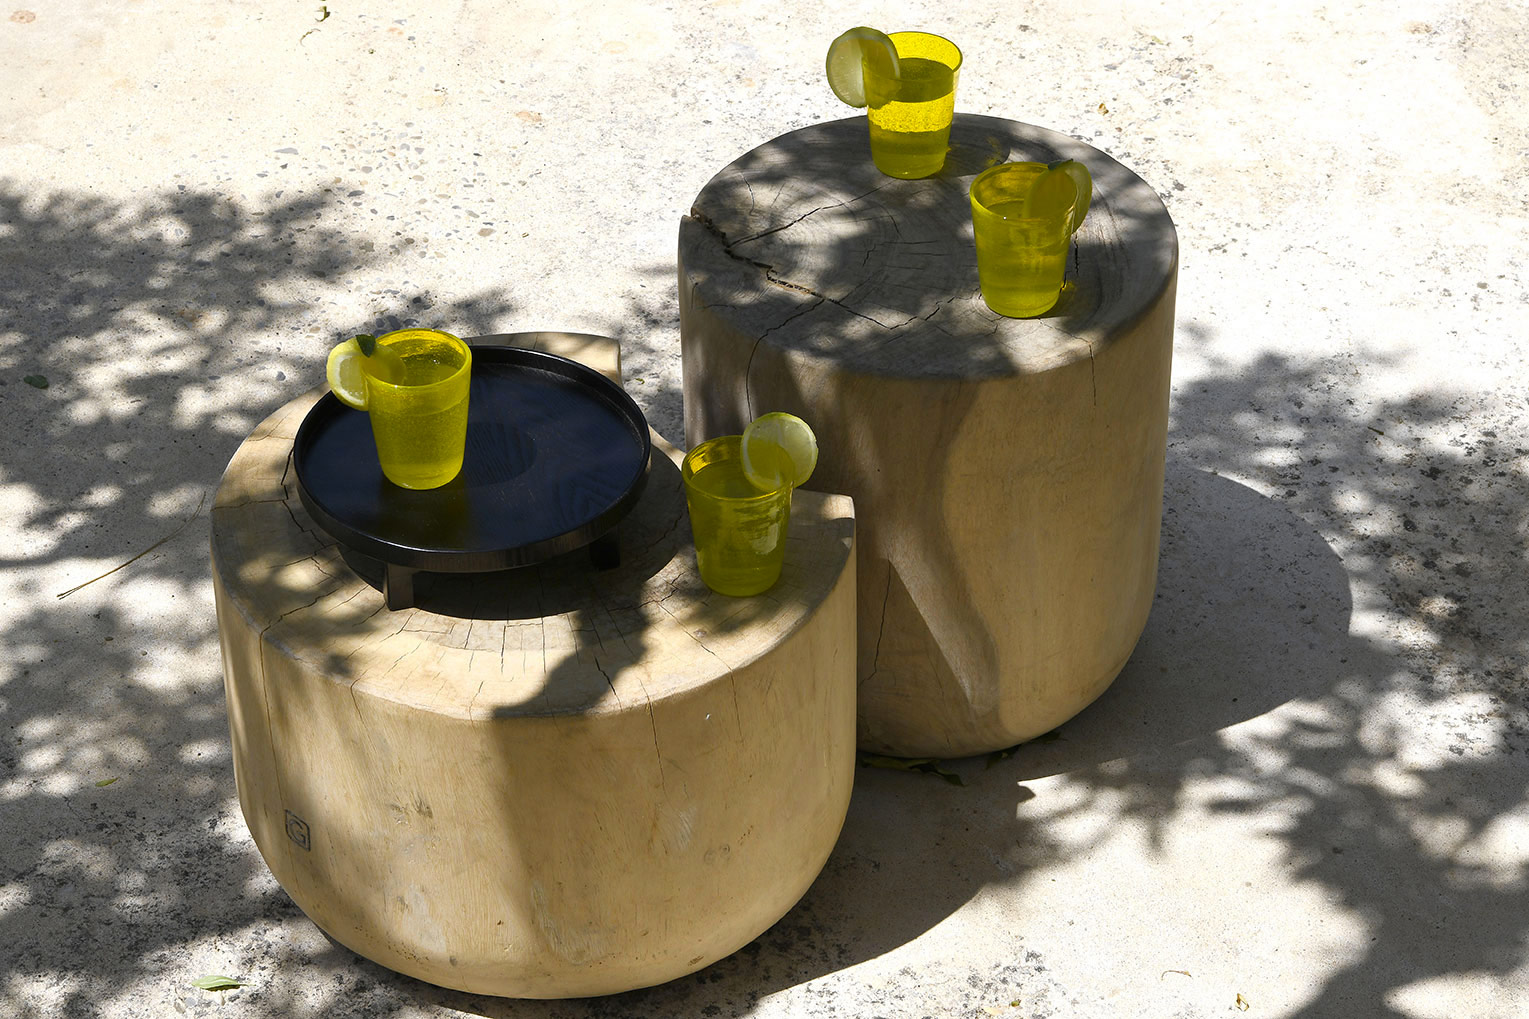 ikigai-rondins-bois